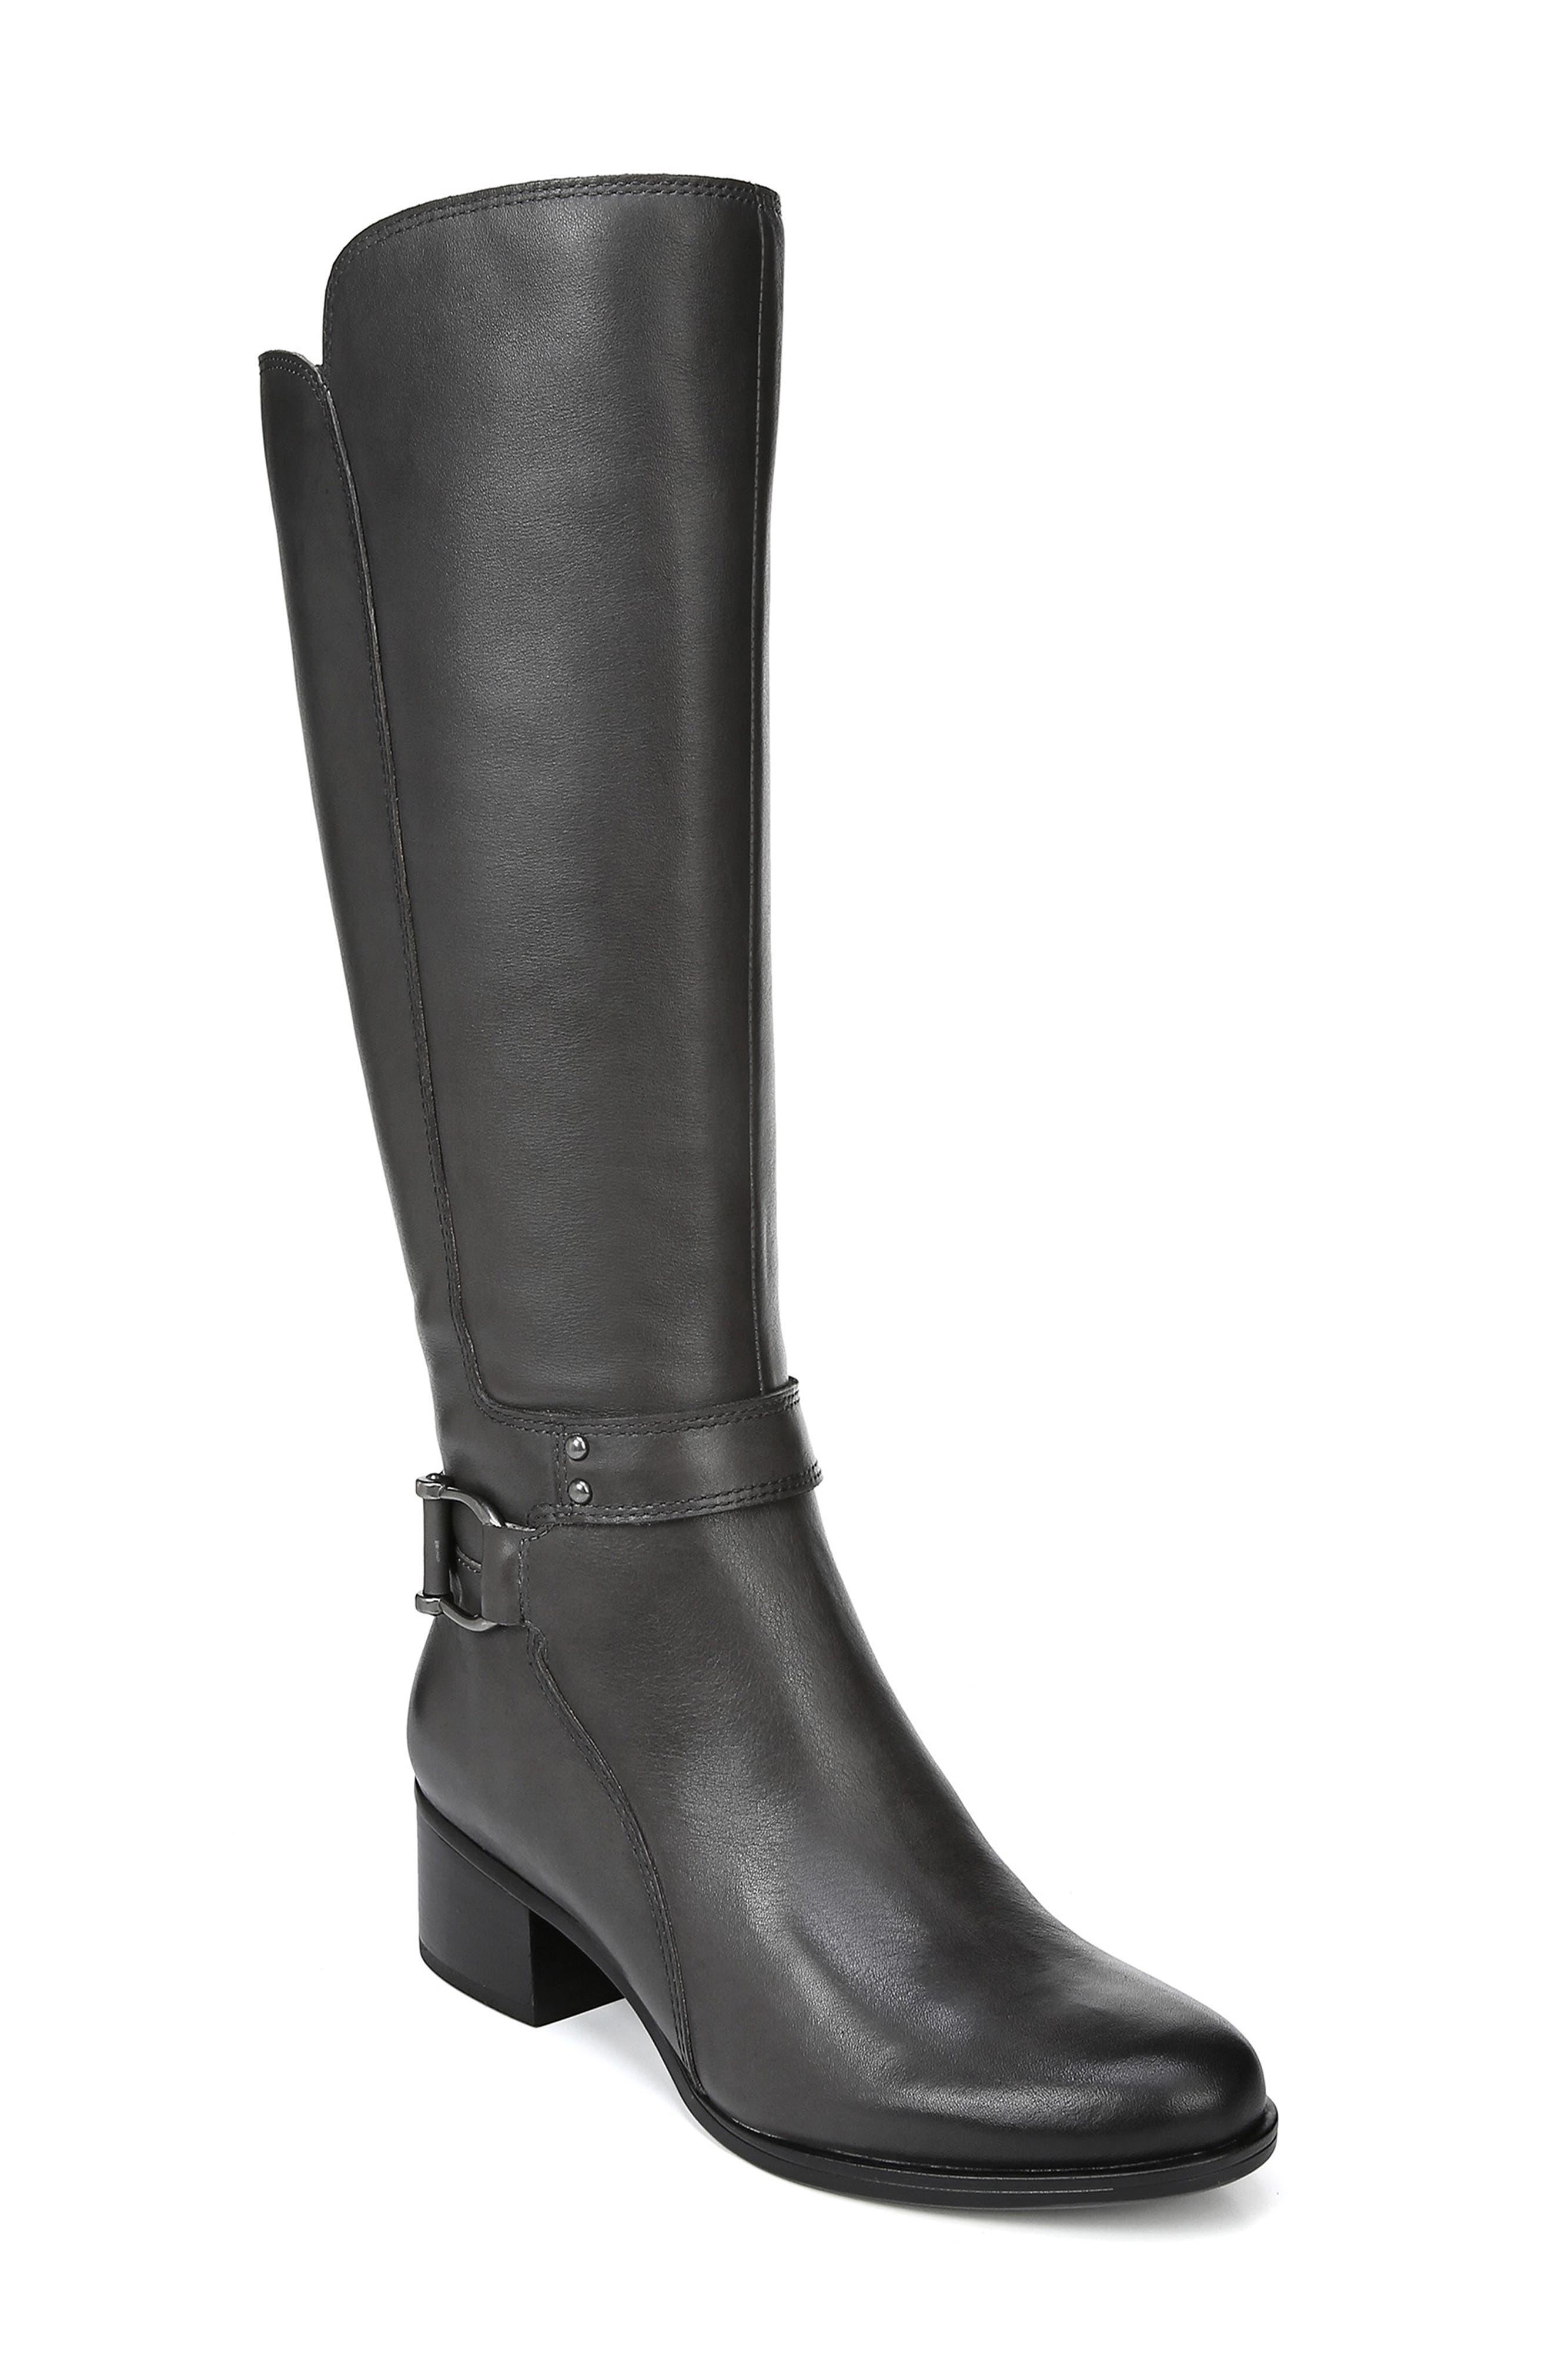 Naturalizer Dane Knee High Riding Boot, Regular Calf W - Grey